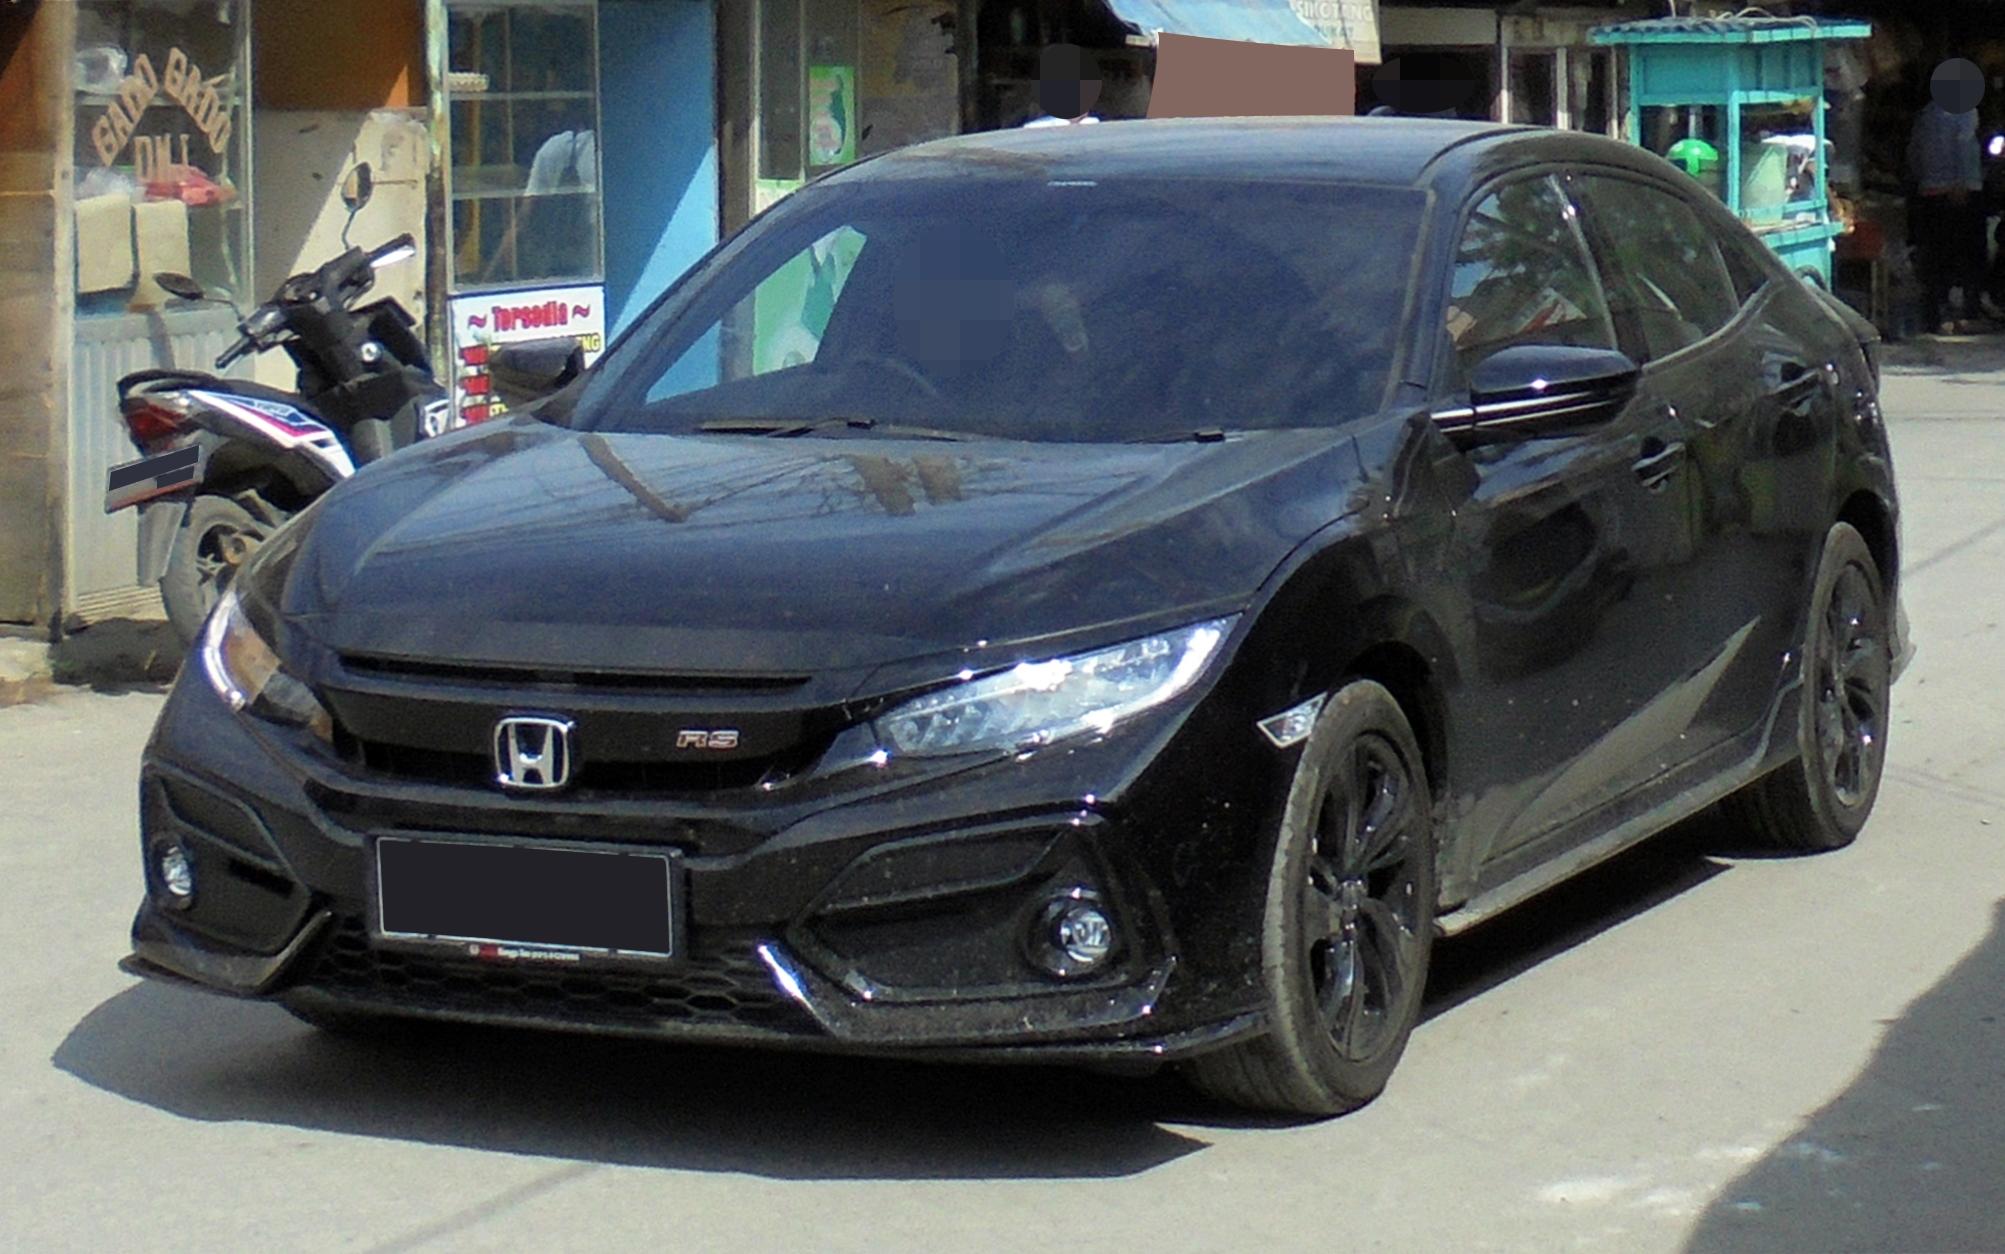 Kekurangan Harga Honda Civic Spesifikasi